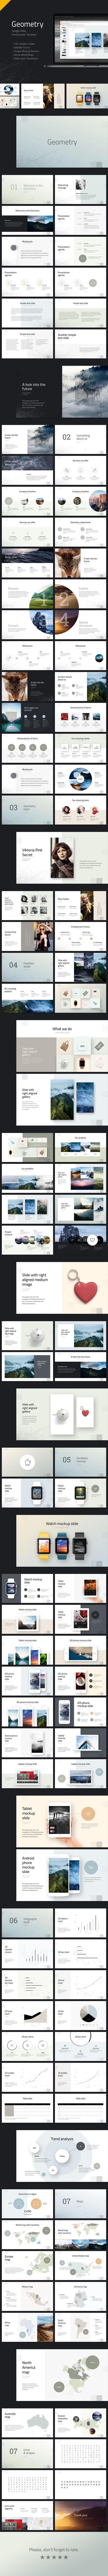 Geometry Google Presentation Template by ReworkMedia | GraphicRiver